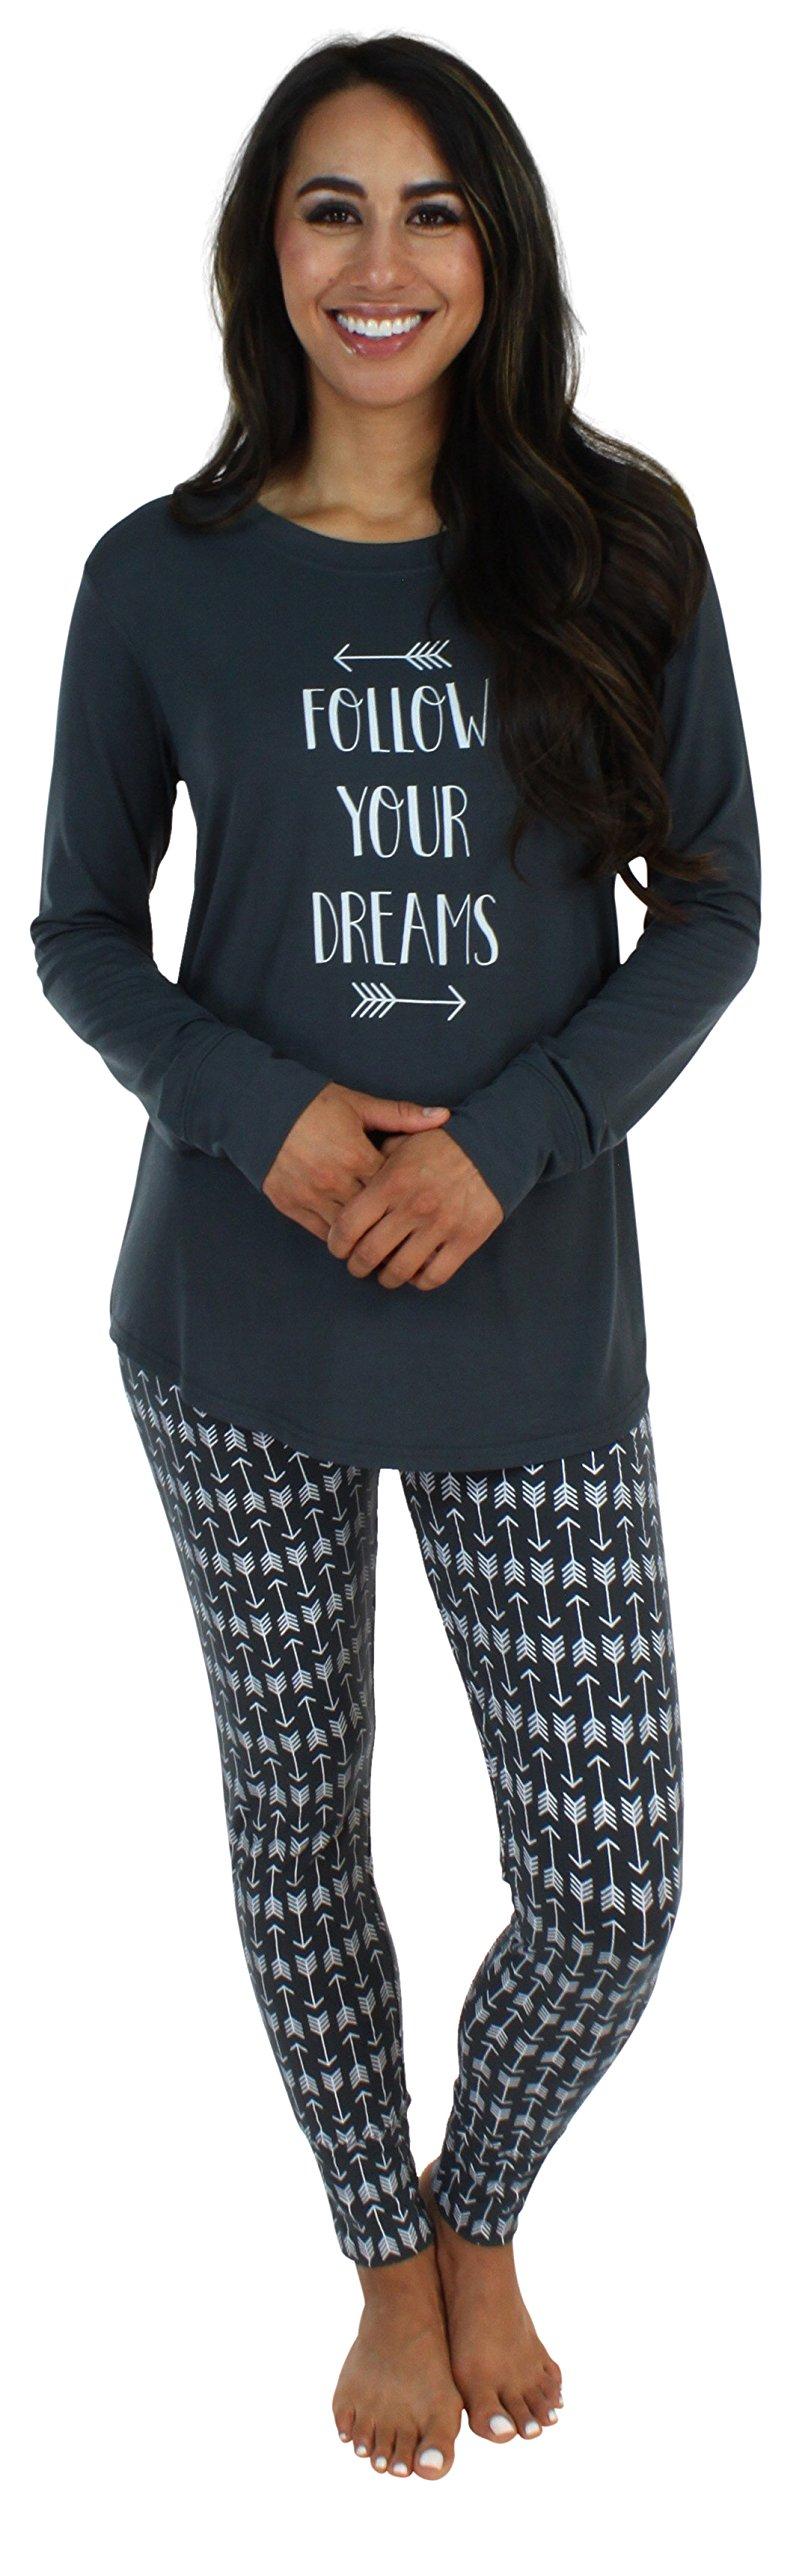 Sleepyheads Women's Sleepwear Knit Longsleeve Top and Leggings Pajamas PJ Set-Arrows (SH1140-4094-MED)